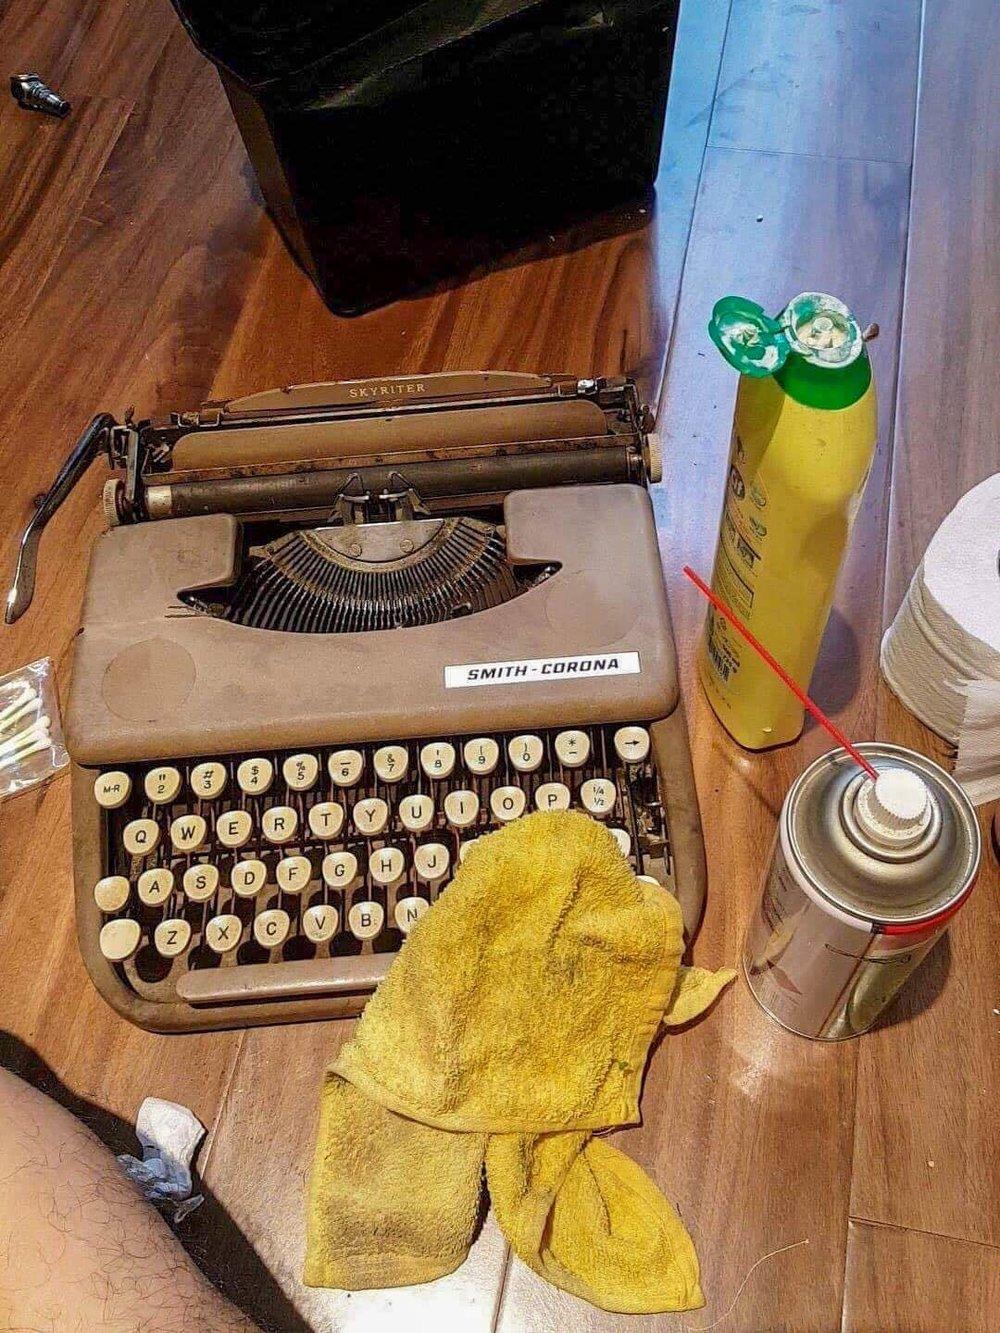 jellykey-typewriter-artisan-keycap-2.jpg